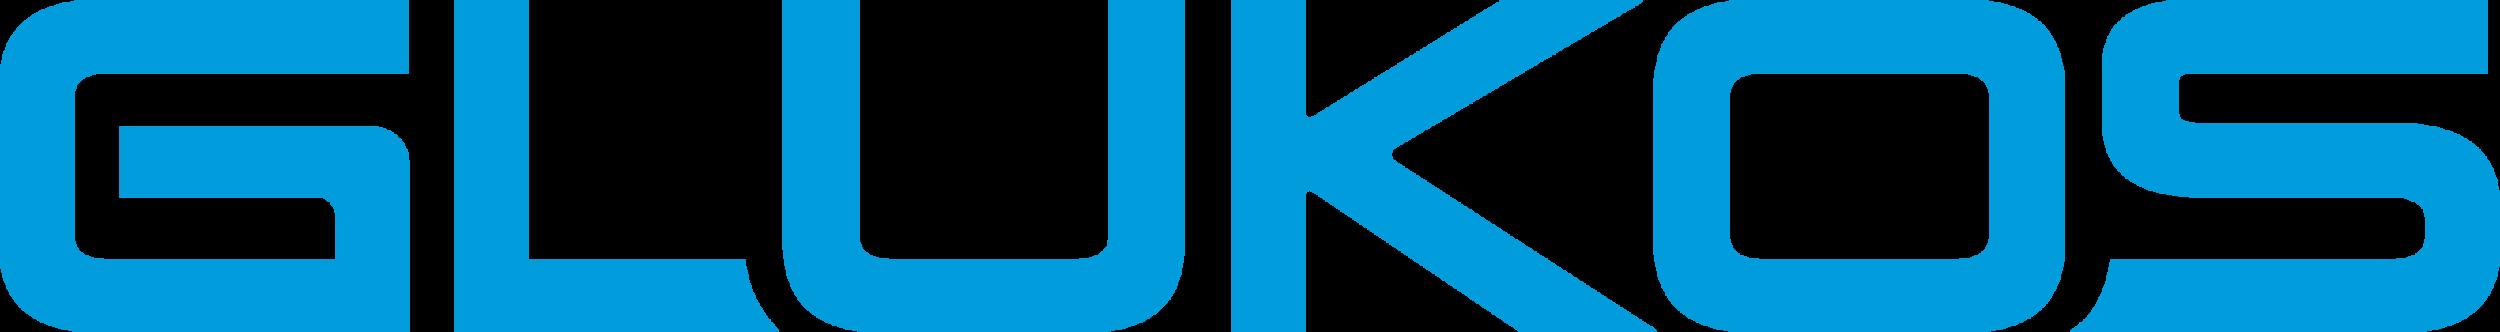 glukos_logo_blue_LG.png